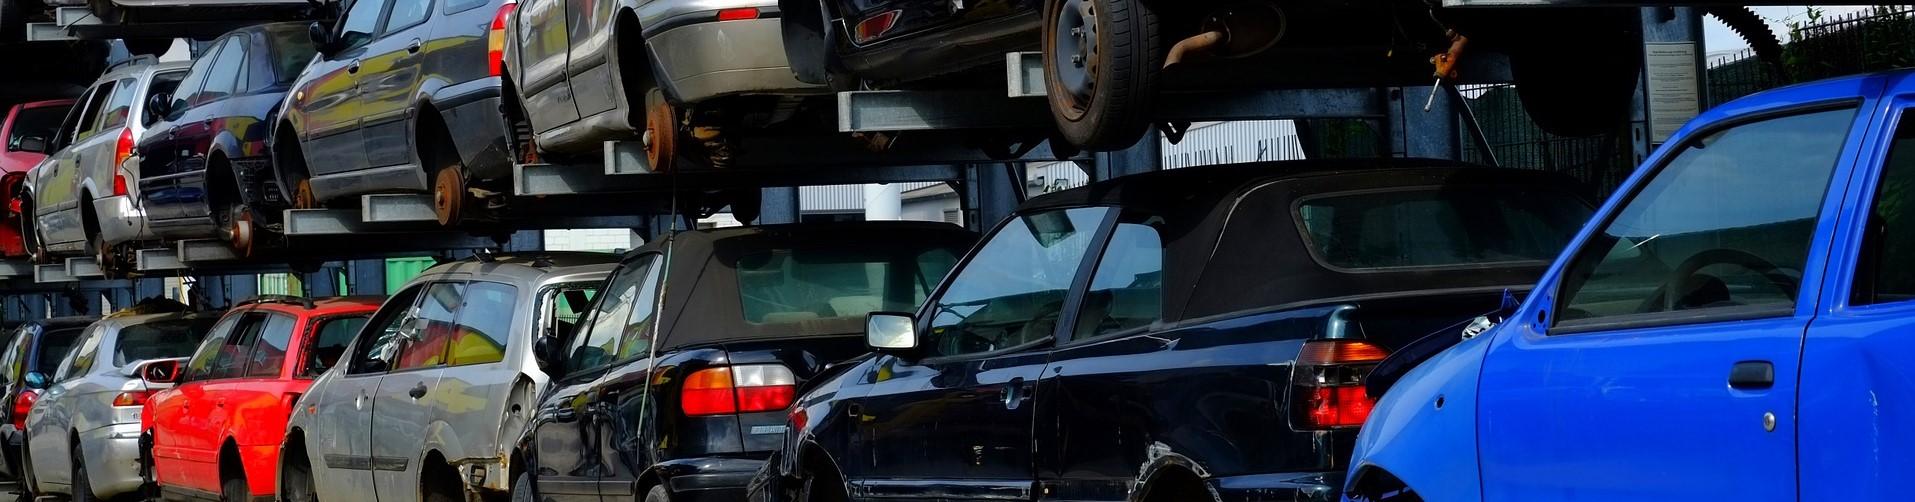 Car Junkyard | Breast Cancer Car Donations